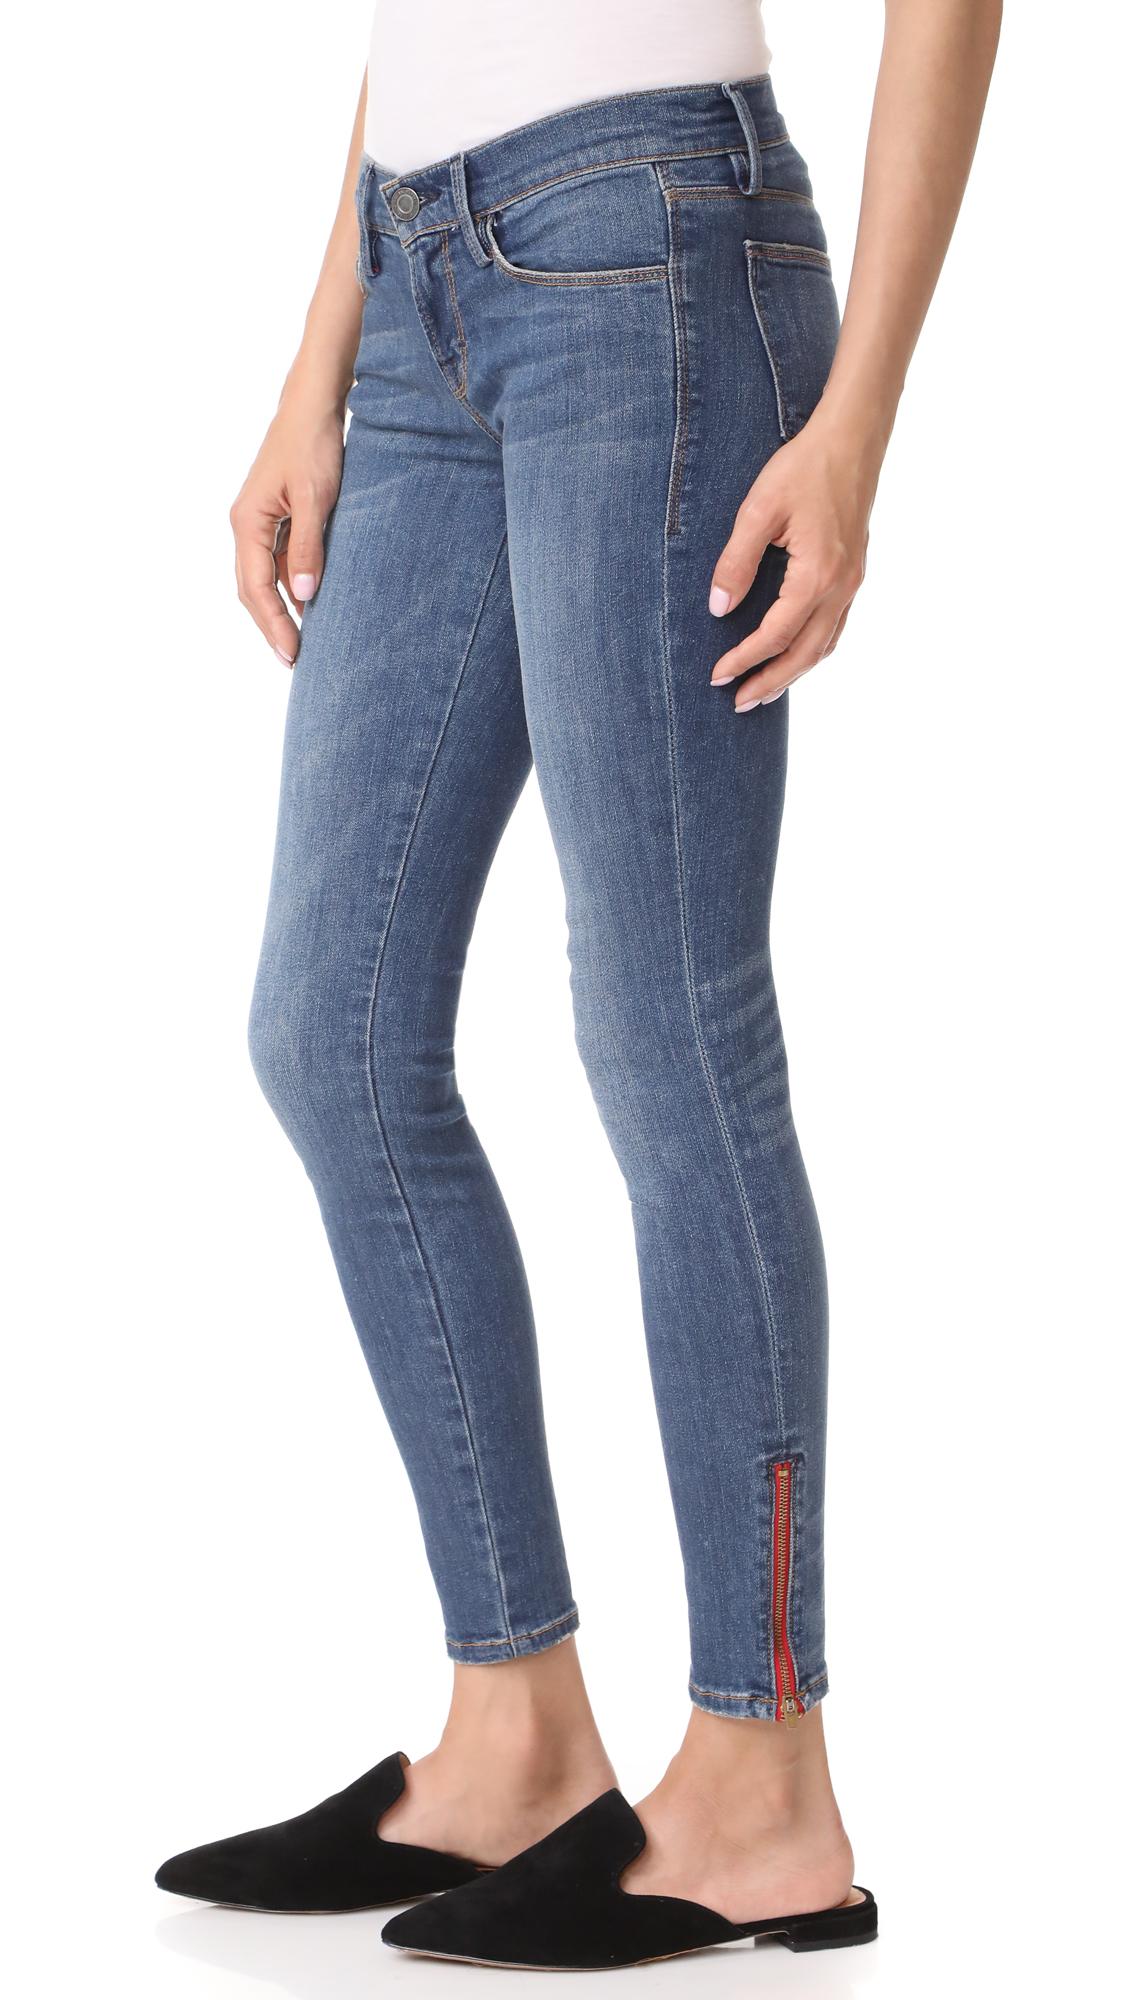 Etienne Marcel L.R. Skinny Jeans - Medium Wash